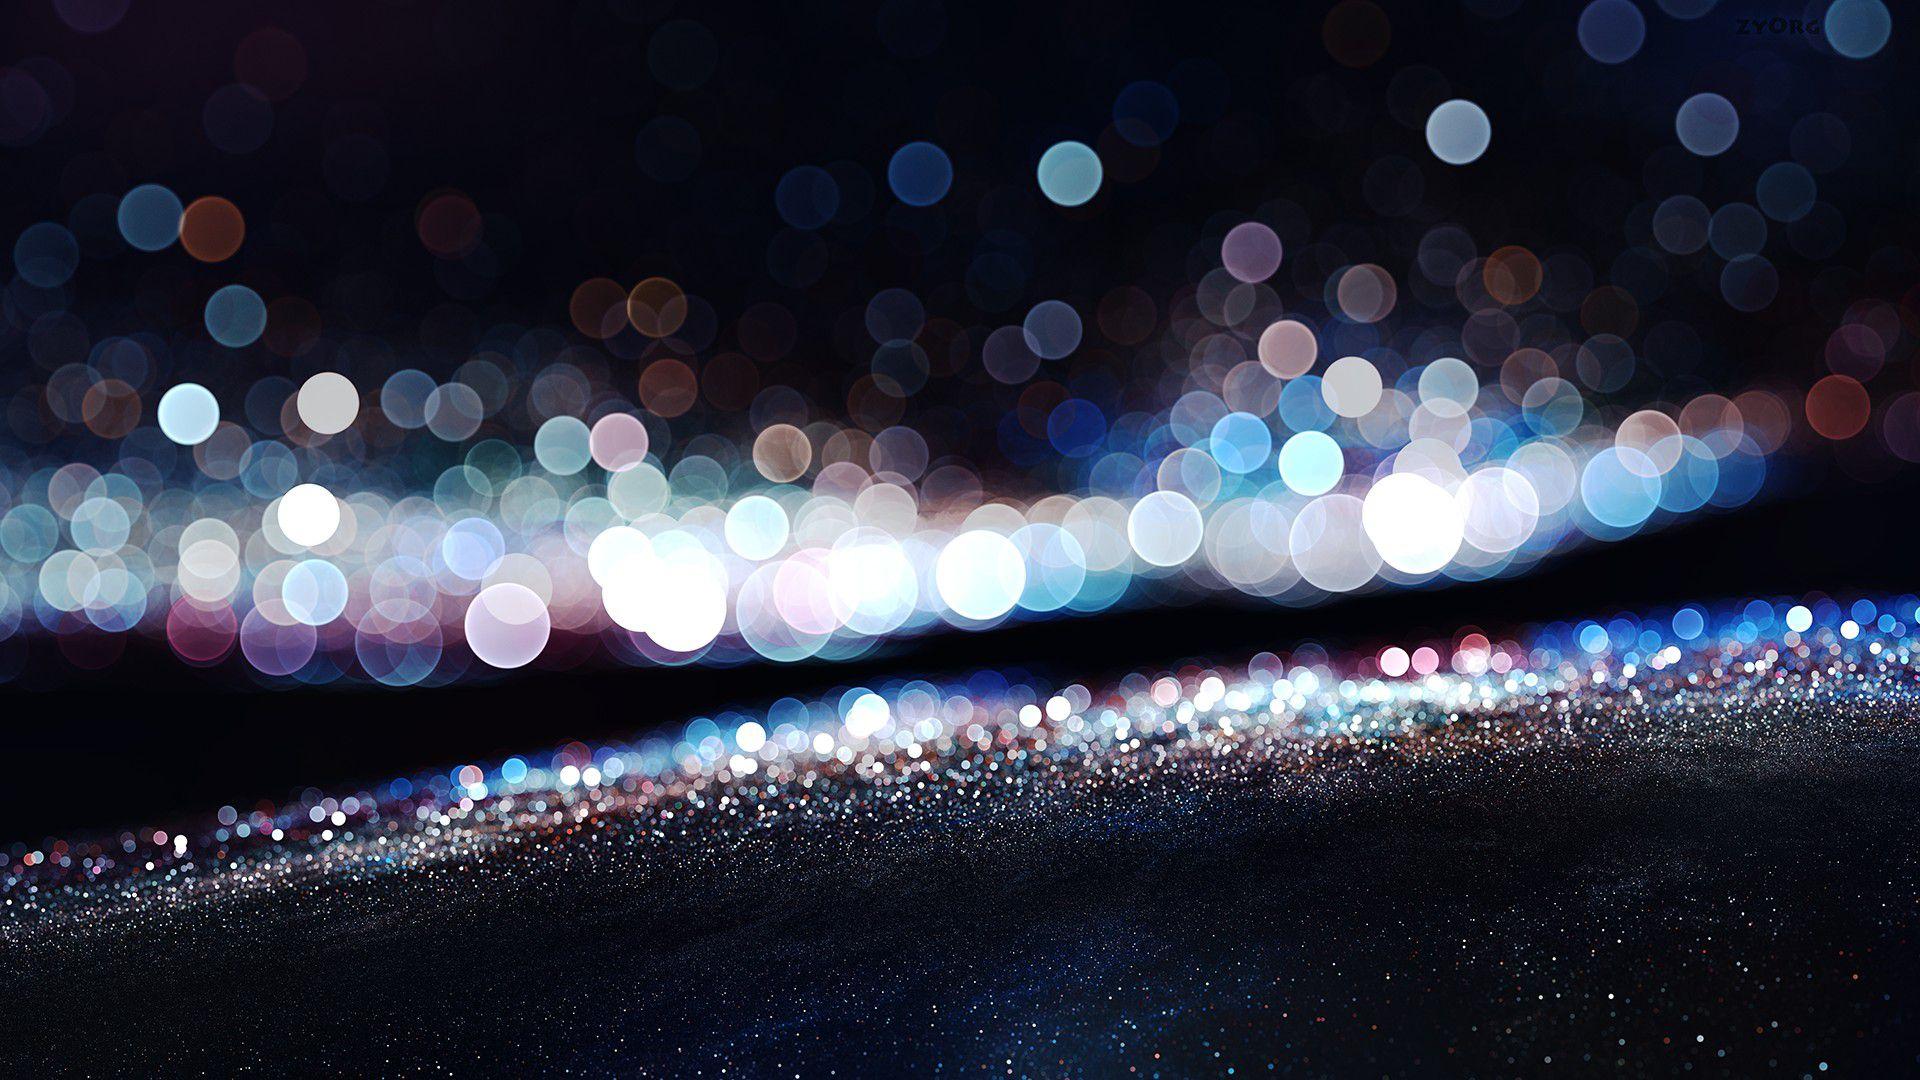 httpfreewallpaperdownloadsnetwallpaper samsung galaxy s5 1920x1080